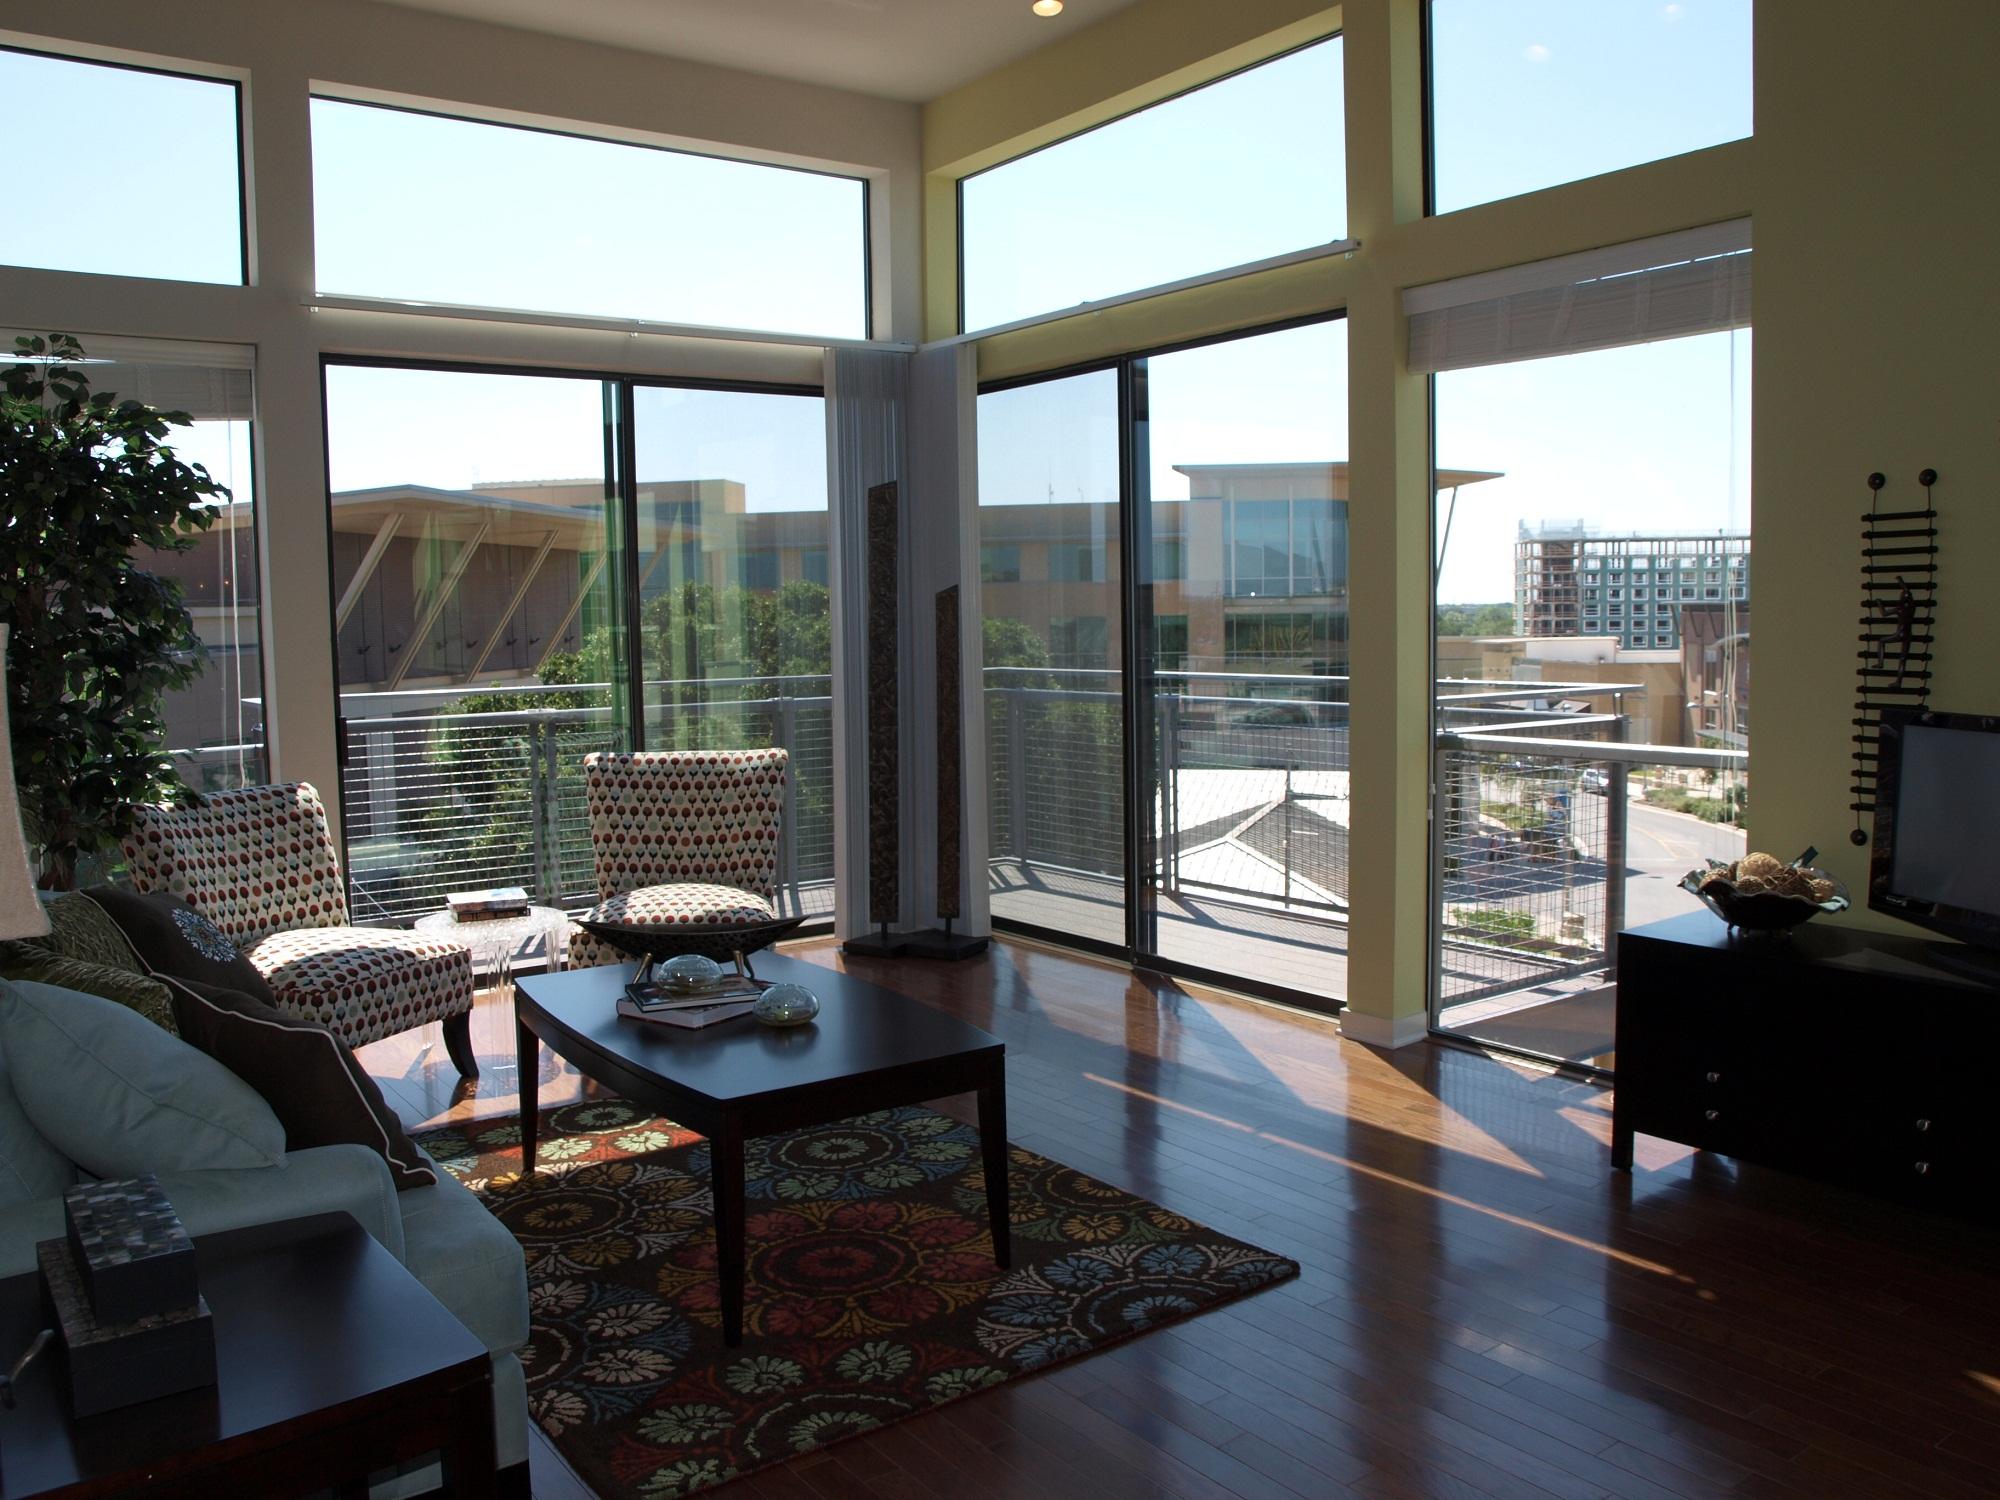 Featured Image of Wonderful Home Decor Austin Design Ideas